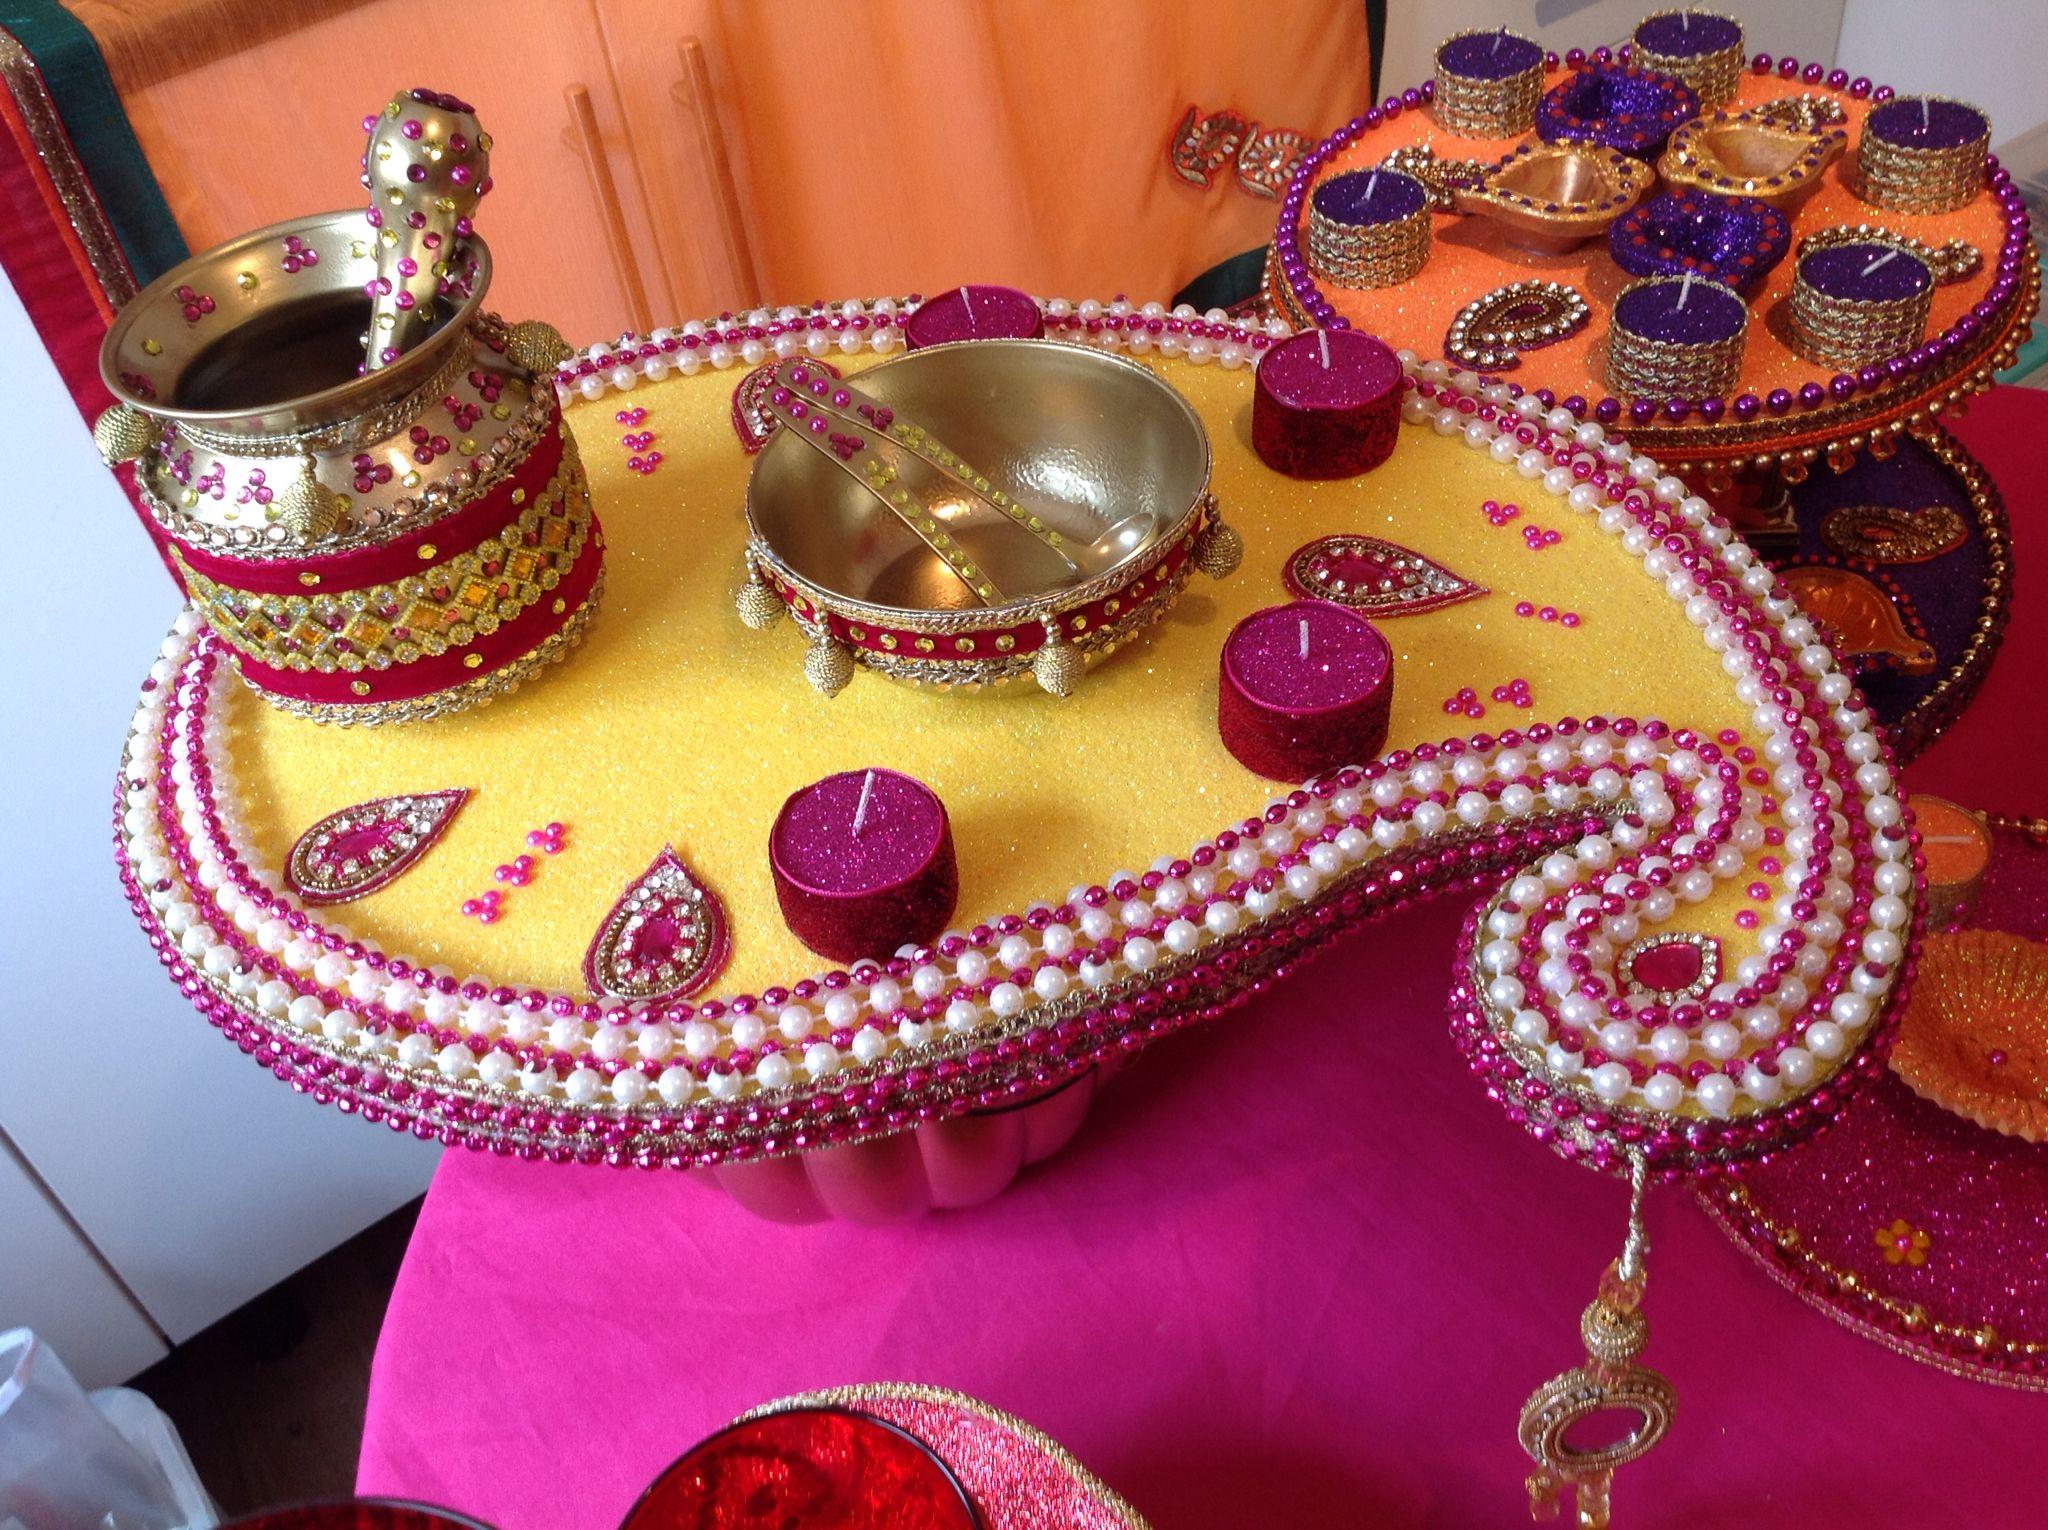 Mehndi Plates Uk : Beautiful large paisley mehndi plate see my facebook page